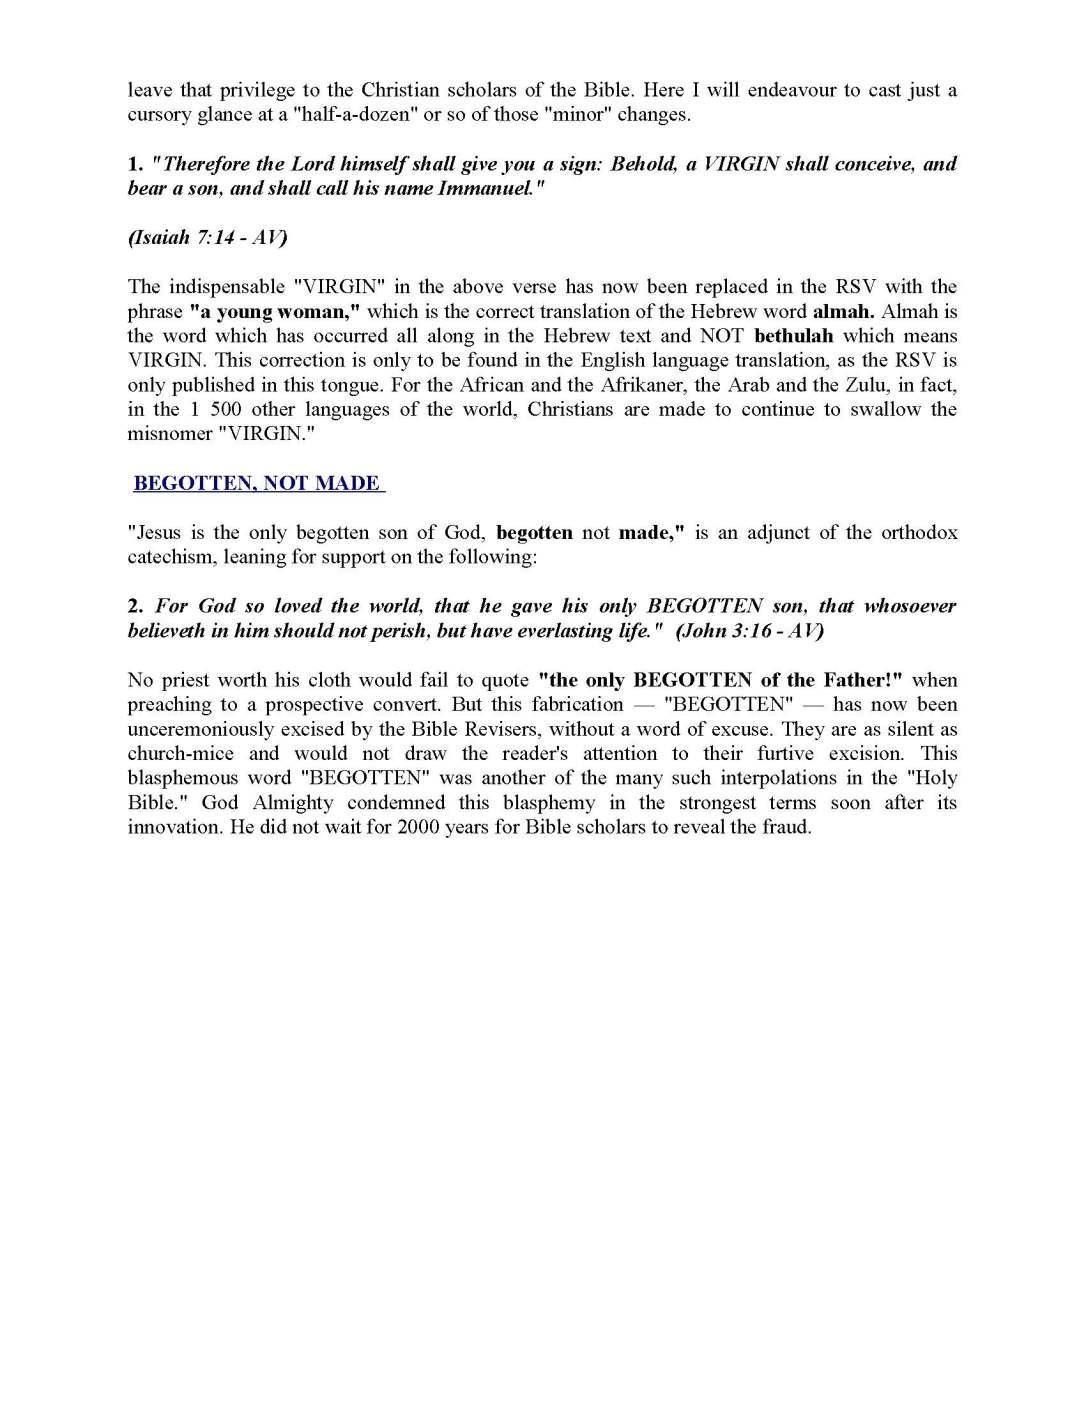 Is The Bible Gods Word [deedat]_Page_11